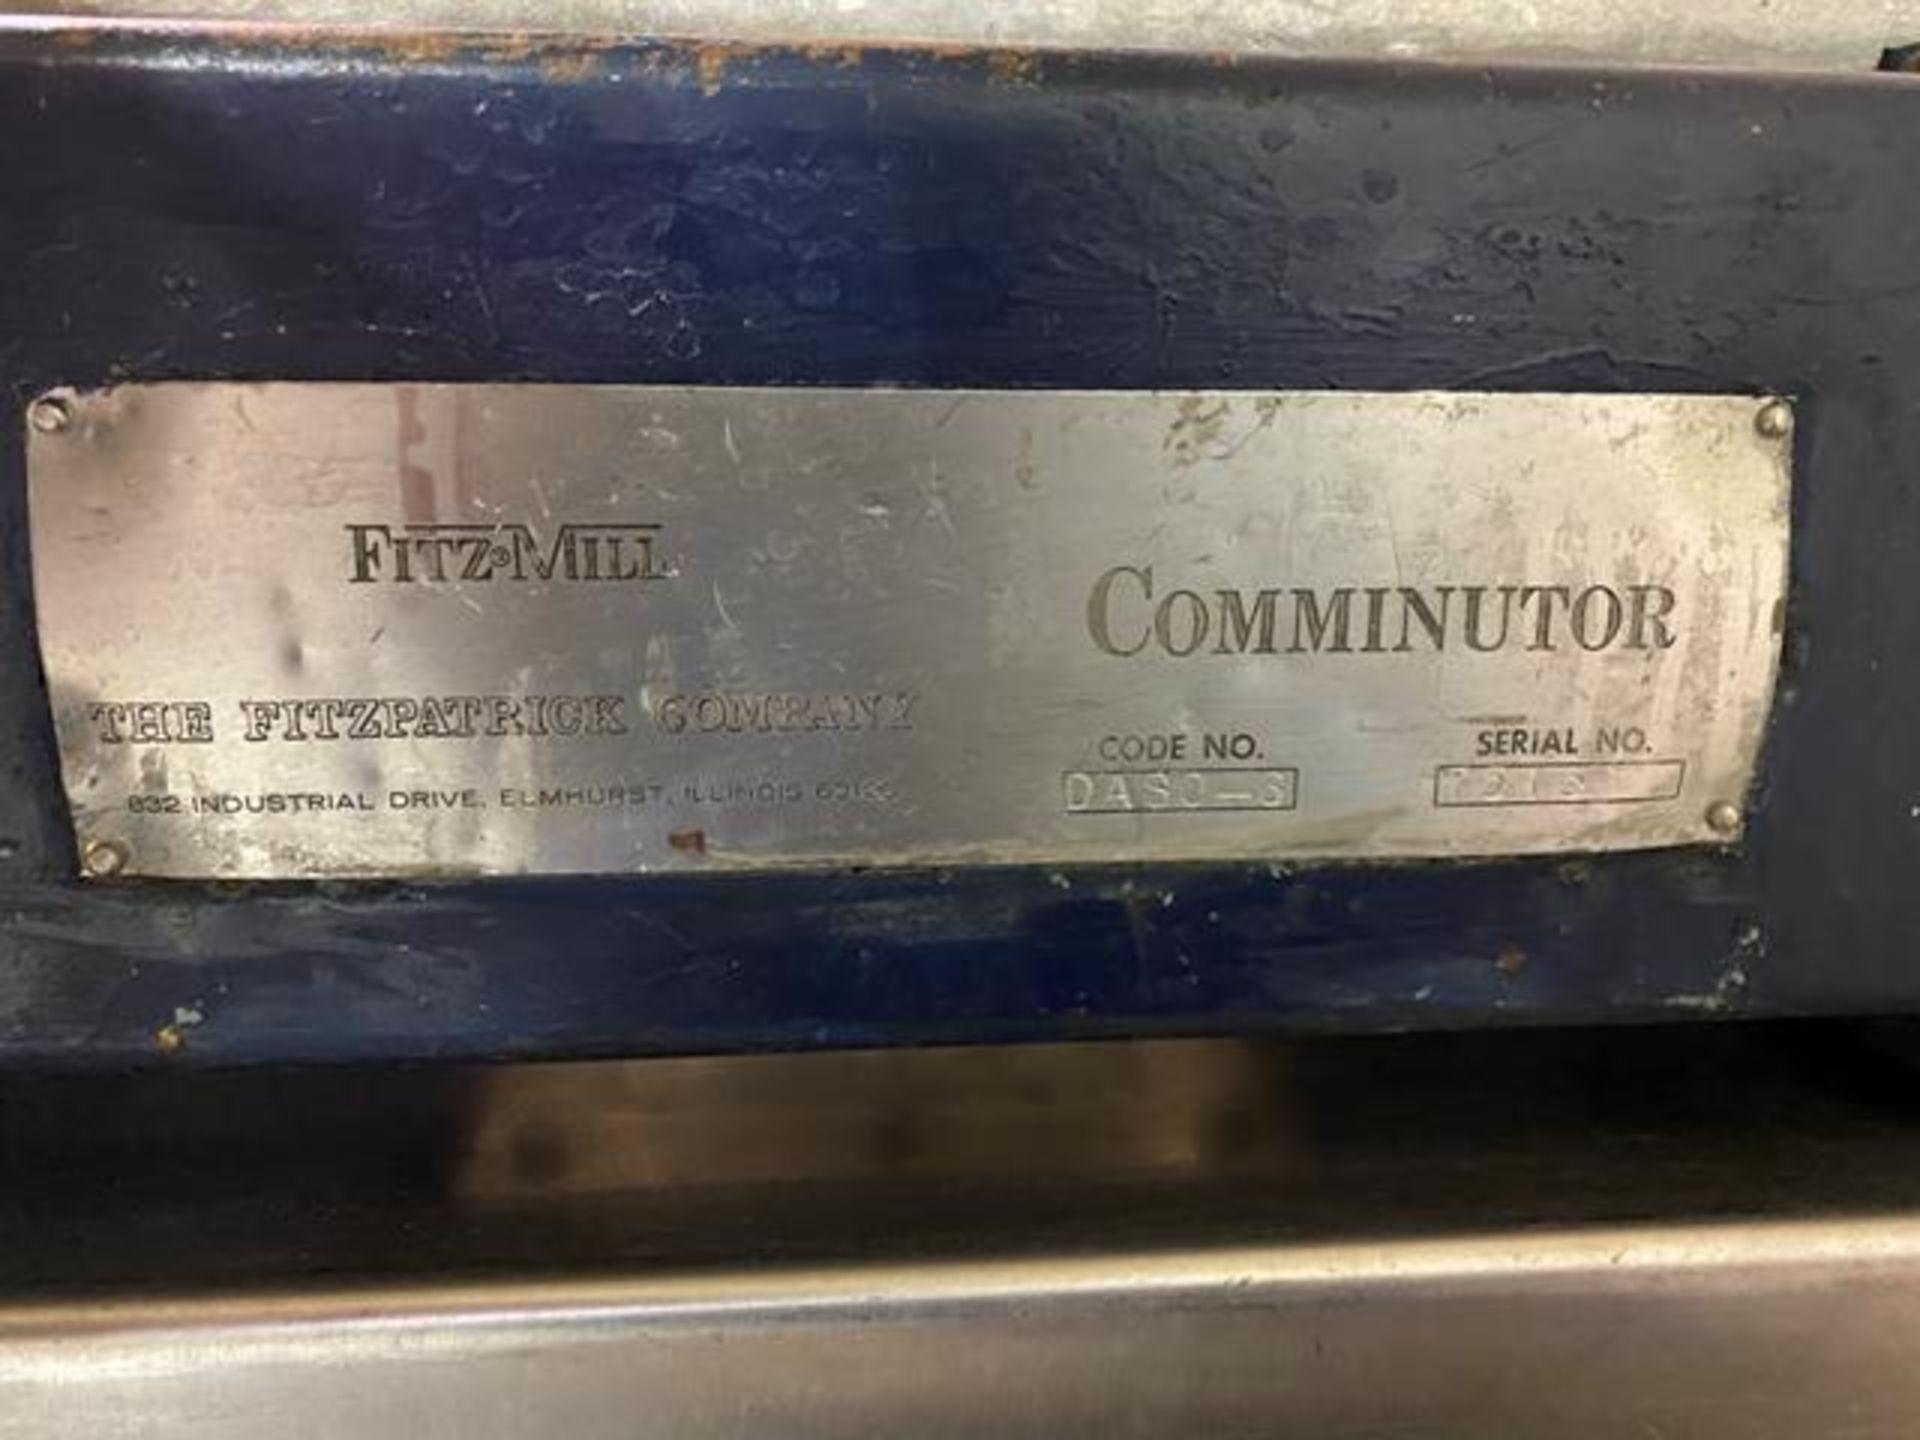 Fitz-Mill Comminutor, Code #DASO-3 - Image 2 of 5